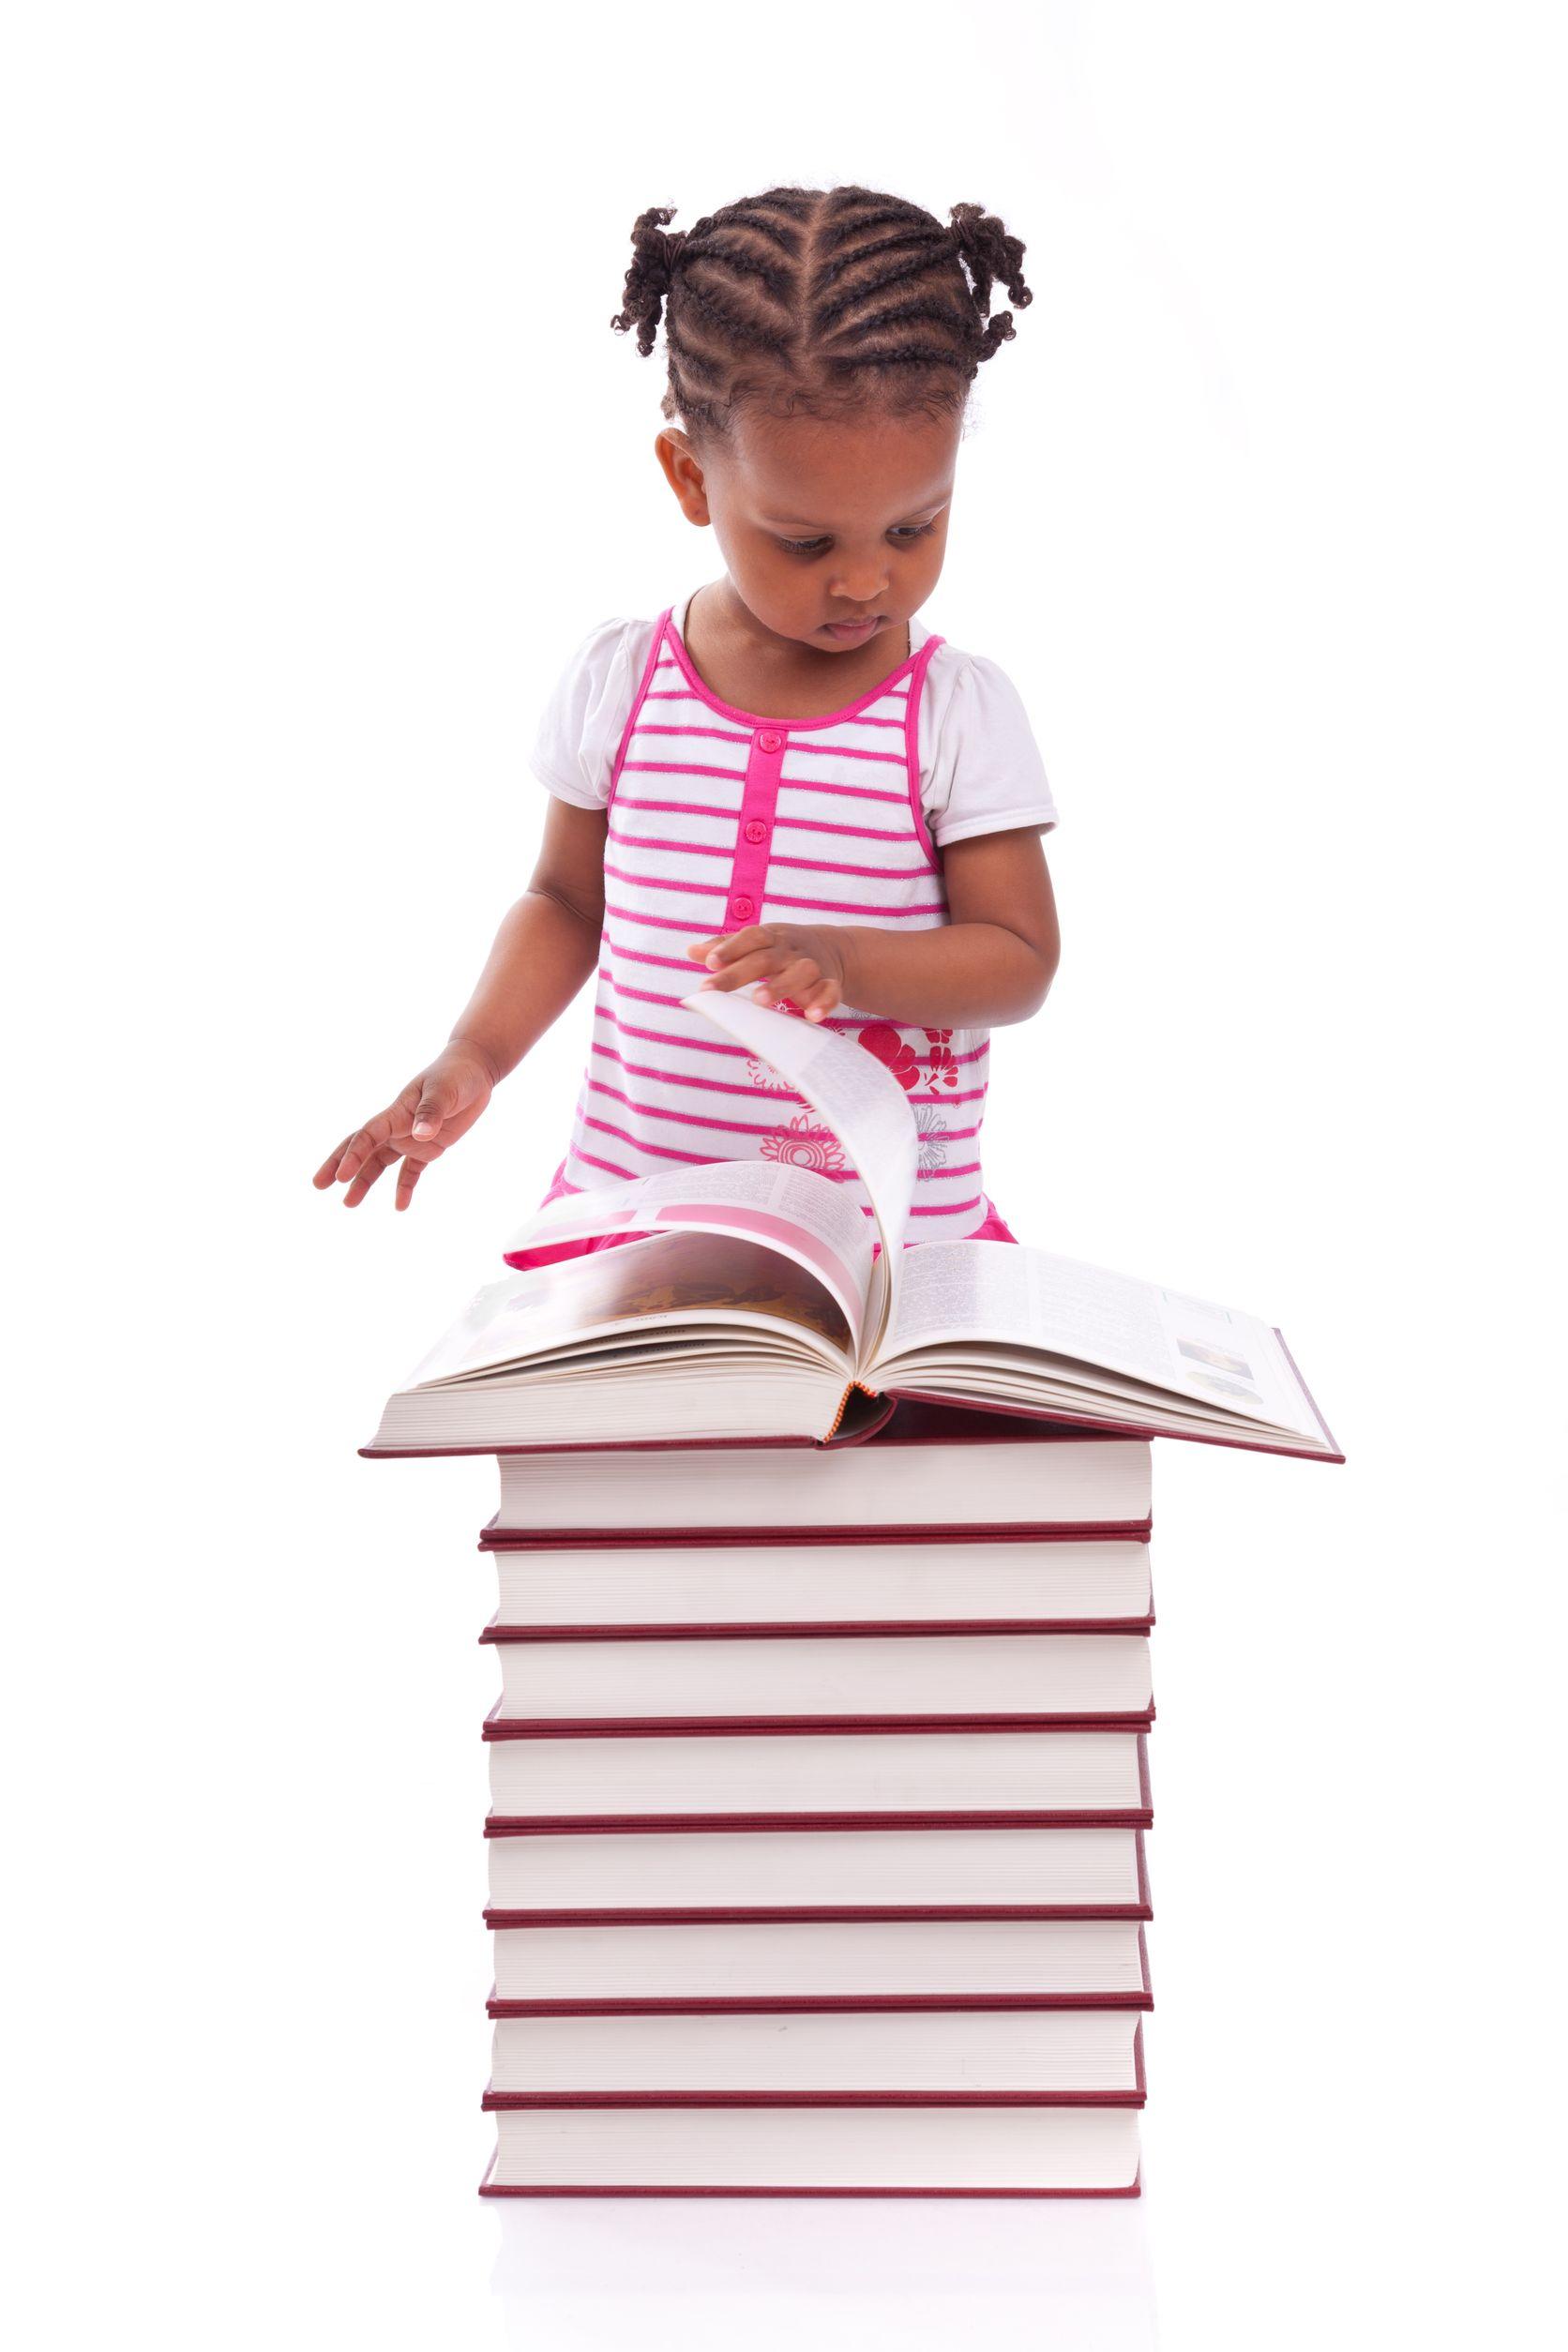 Preschool For 3 Year Olds